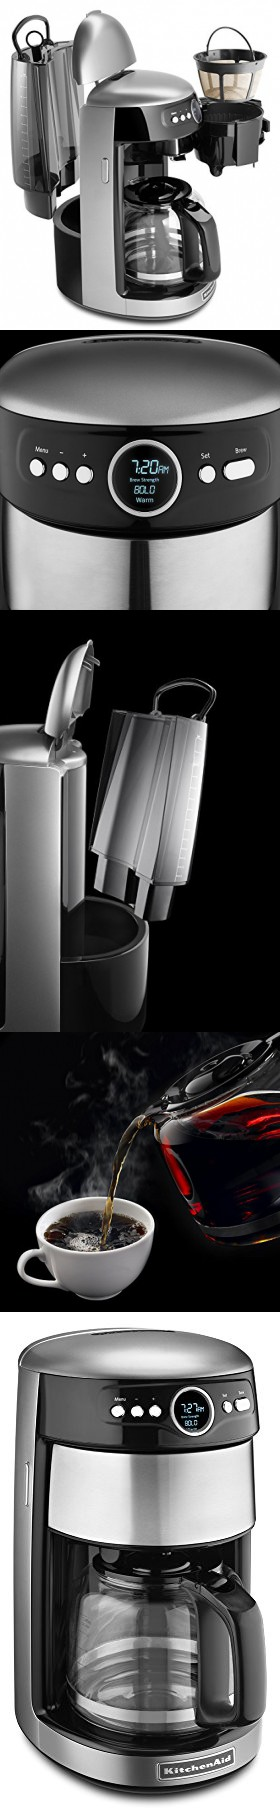 KitchenAid KCM1402CU 14Cup Glass Carafe Coffee Maker